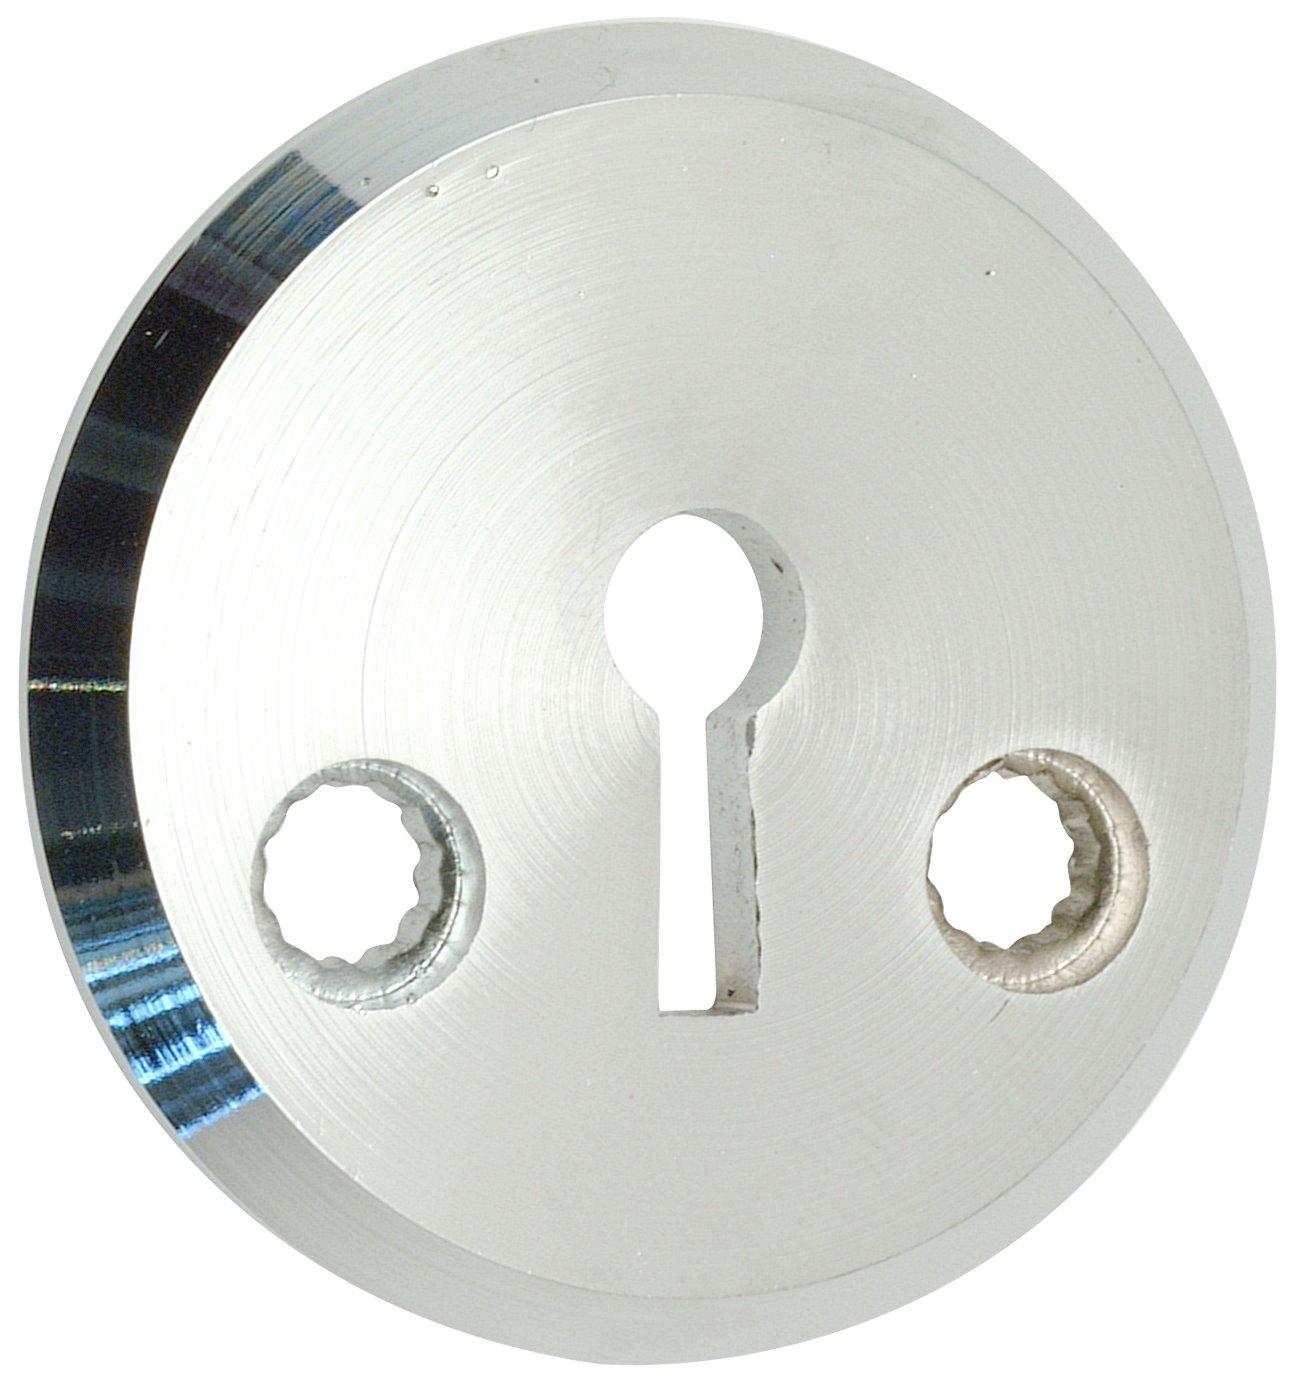 Nyckelskylt 2991